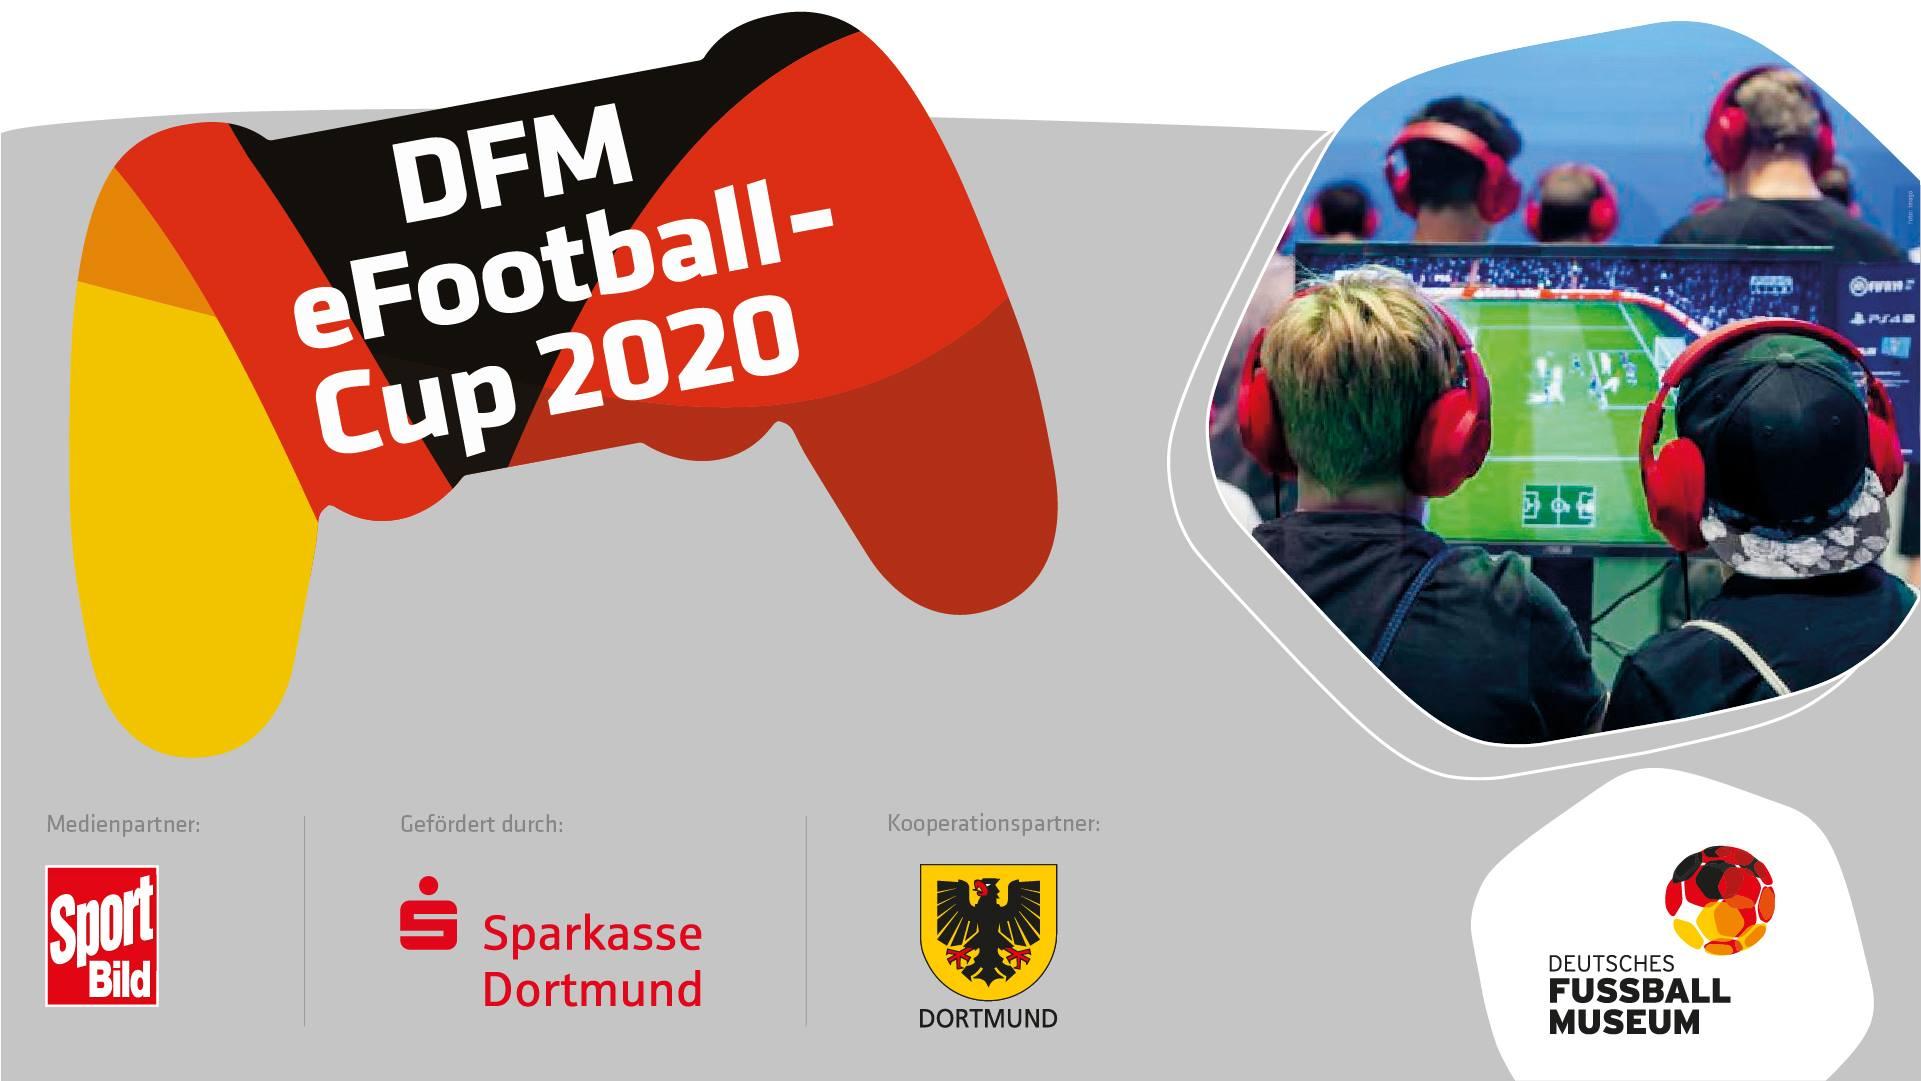 DFM Football Cup 2020